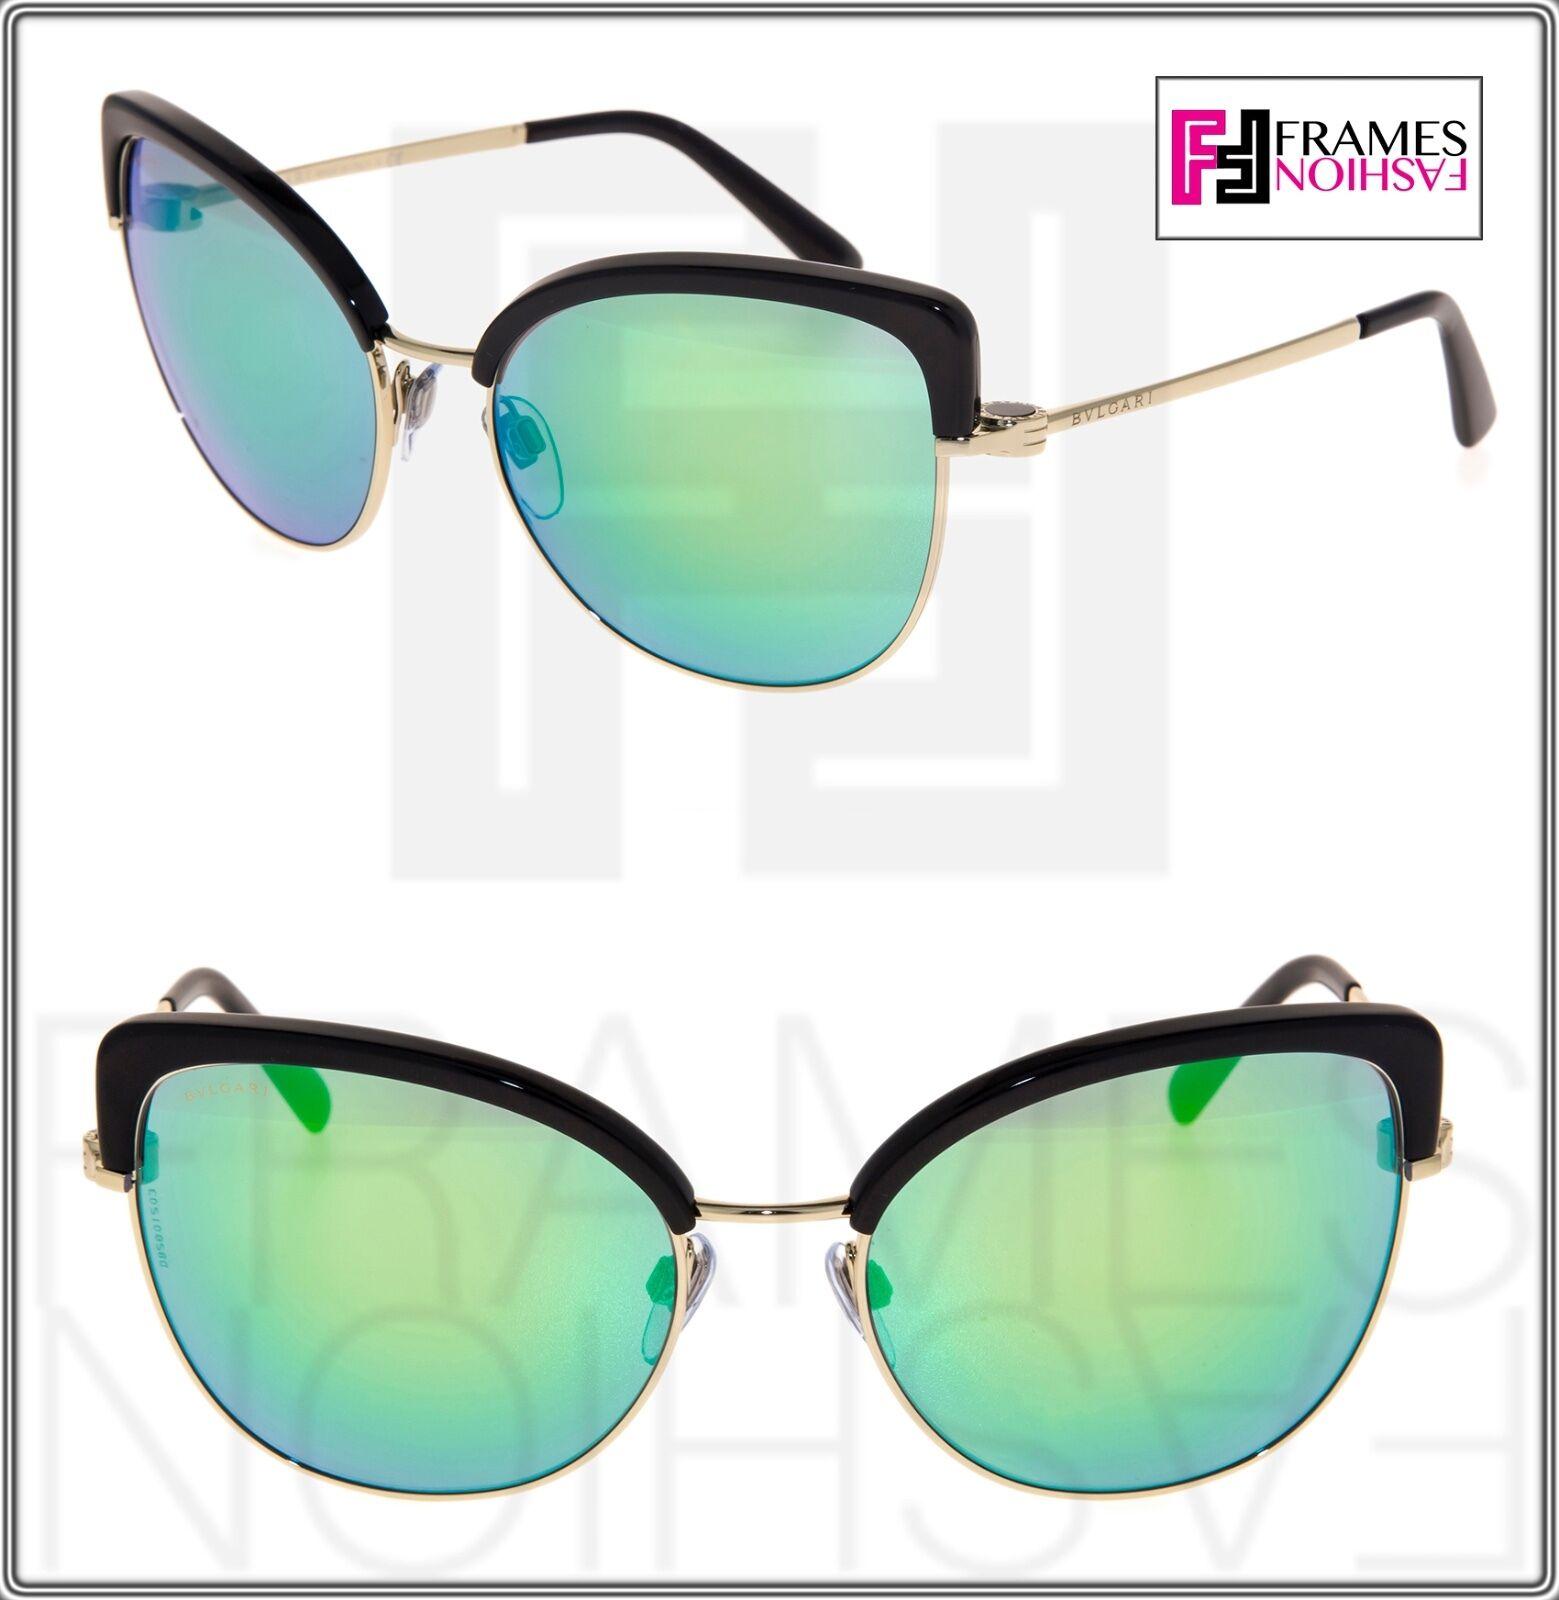 BVLGARI SIGNS COIN Gold Black Green Mirrored Metal Sunglasses BV6082 6082 Women